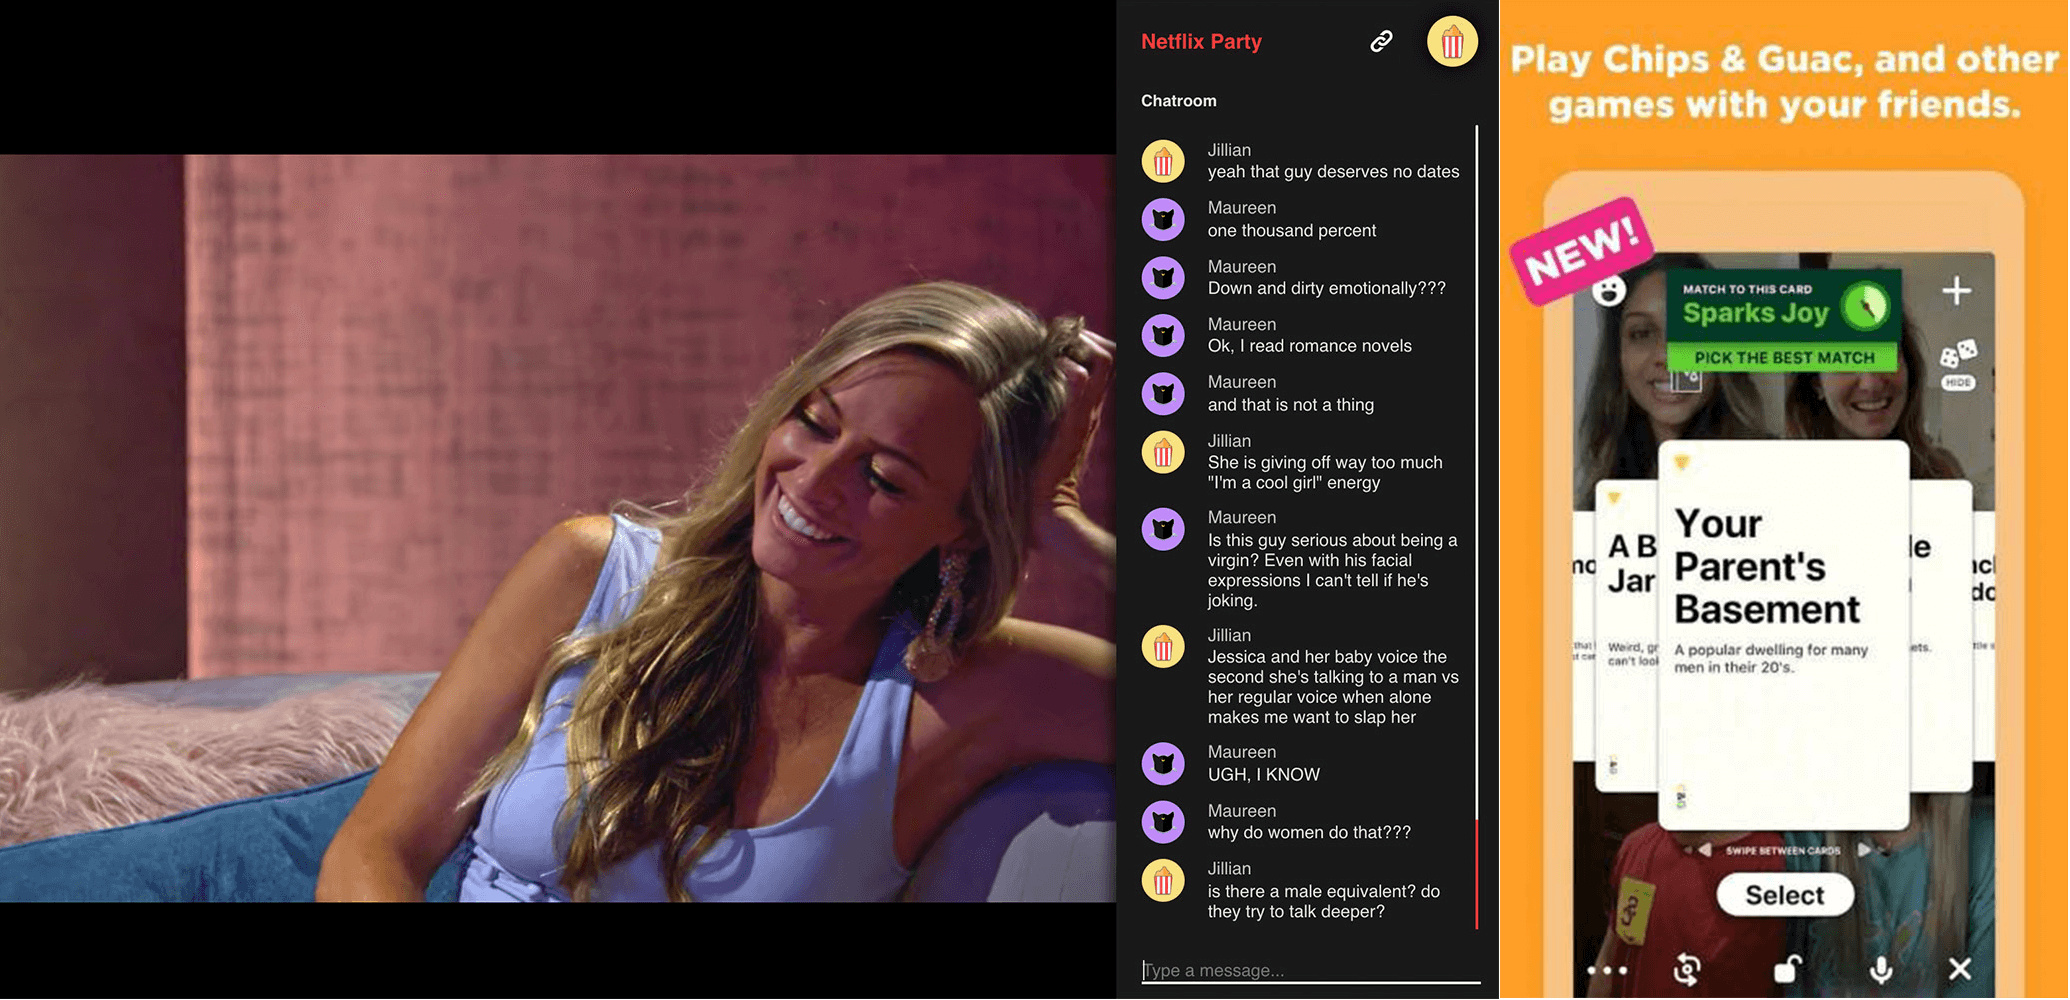 Tillägget Netflix party och appen Houseparty